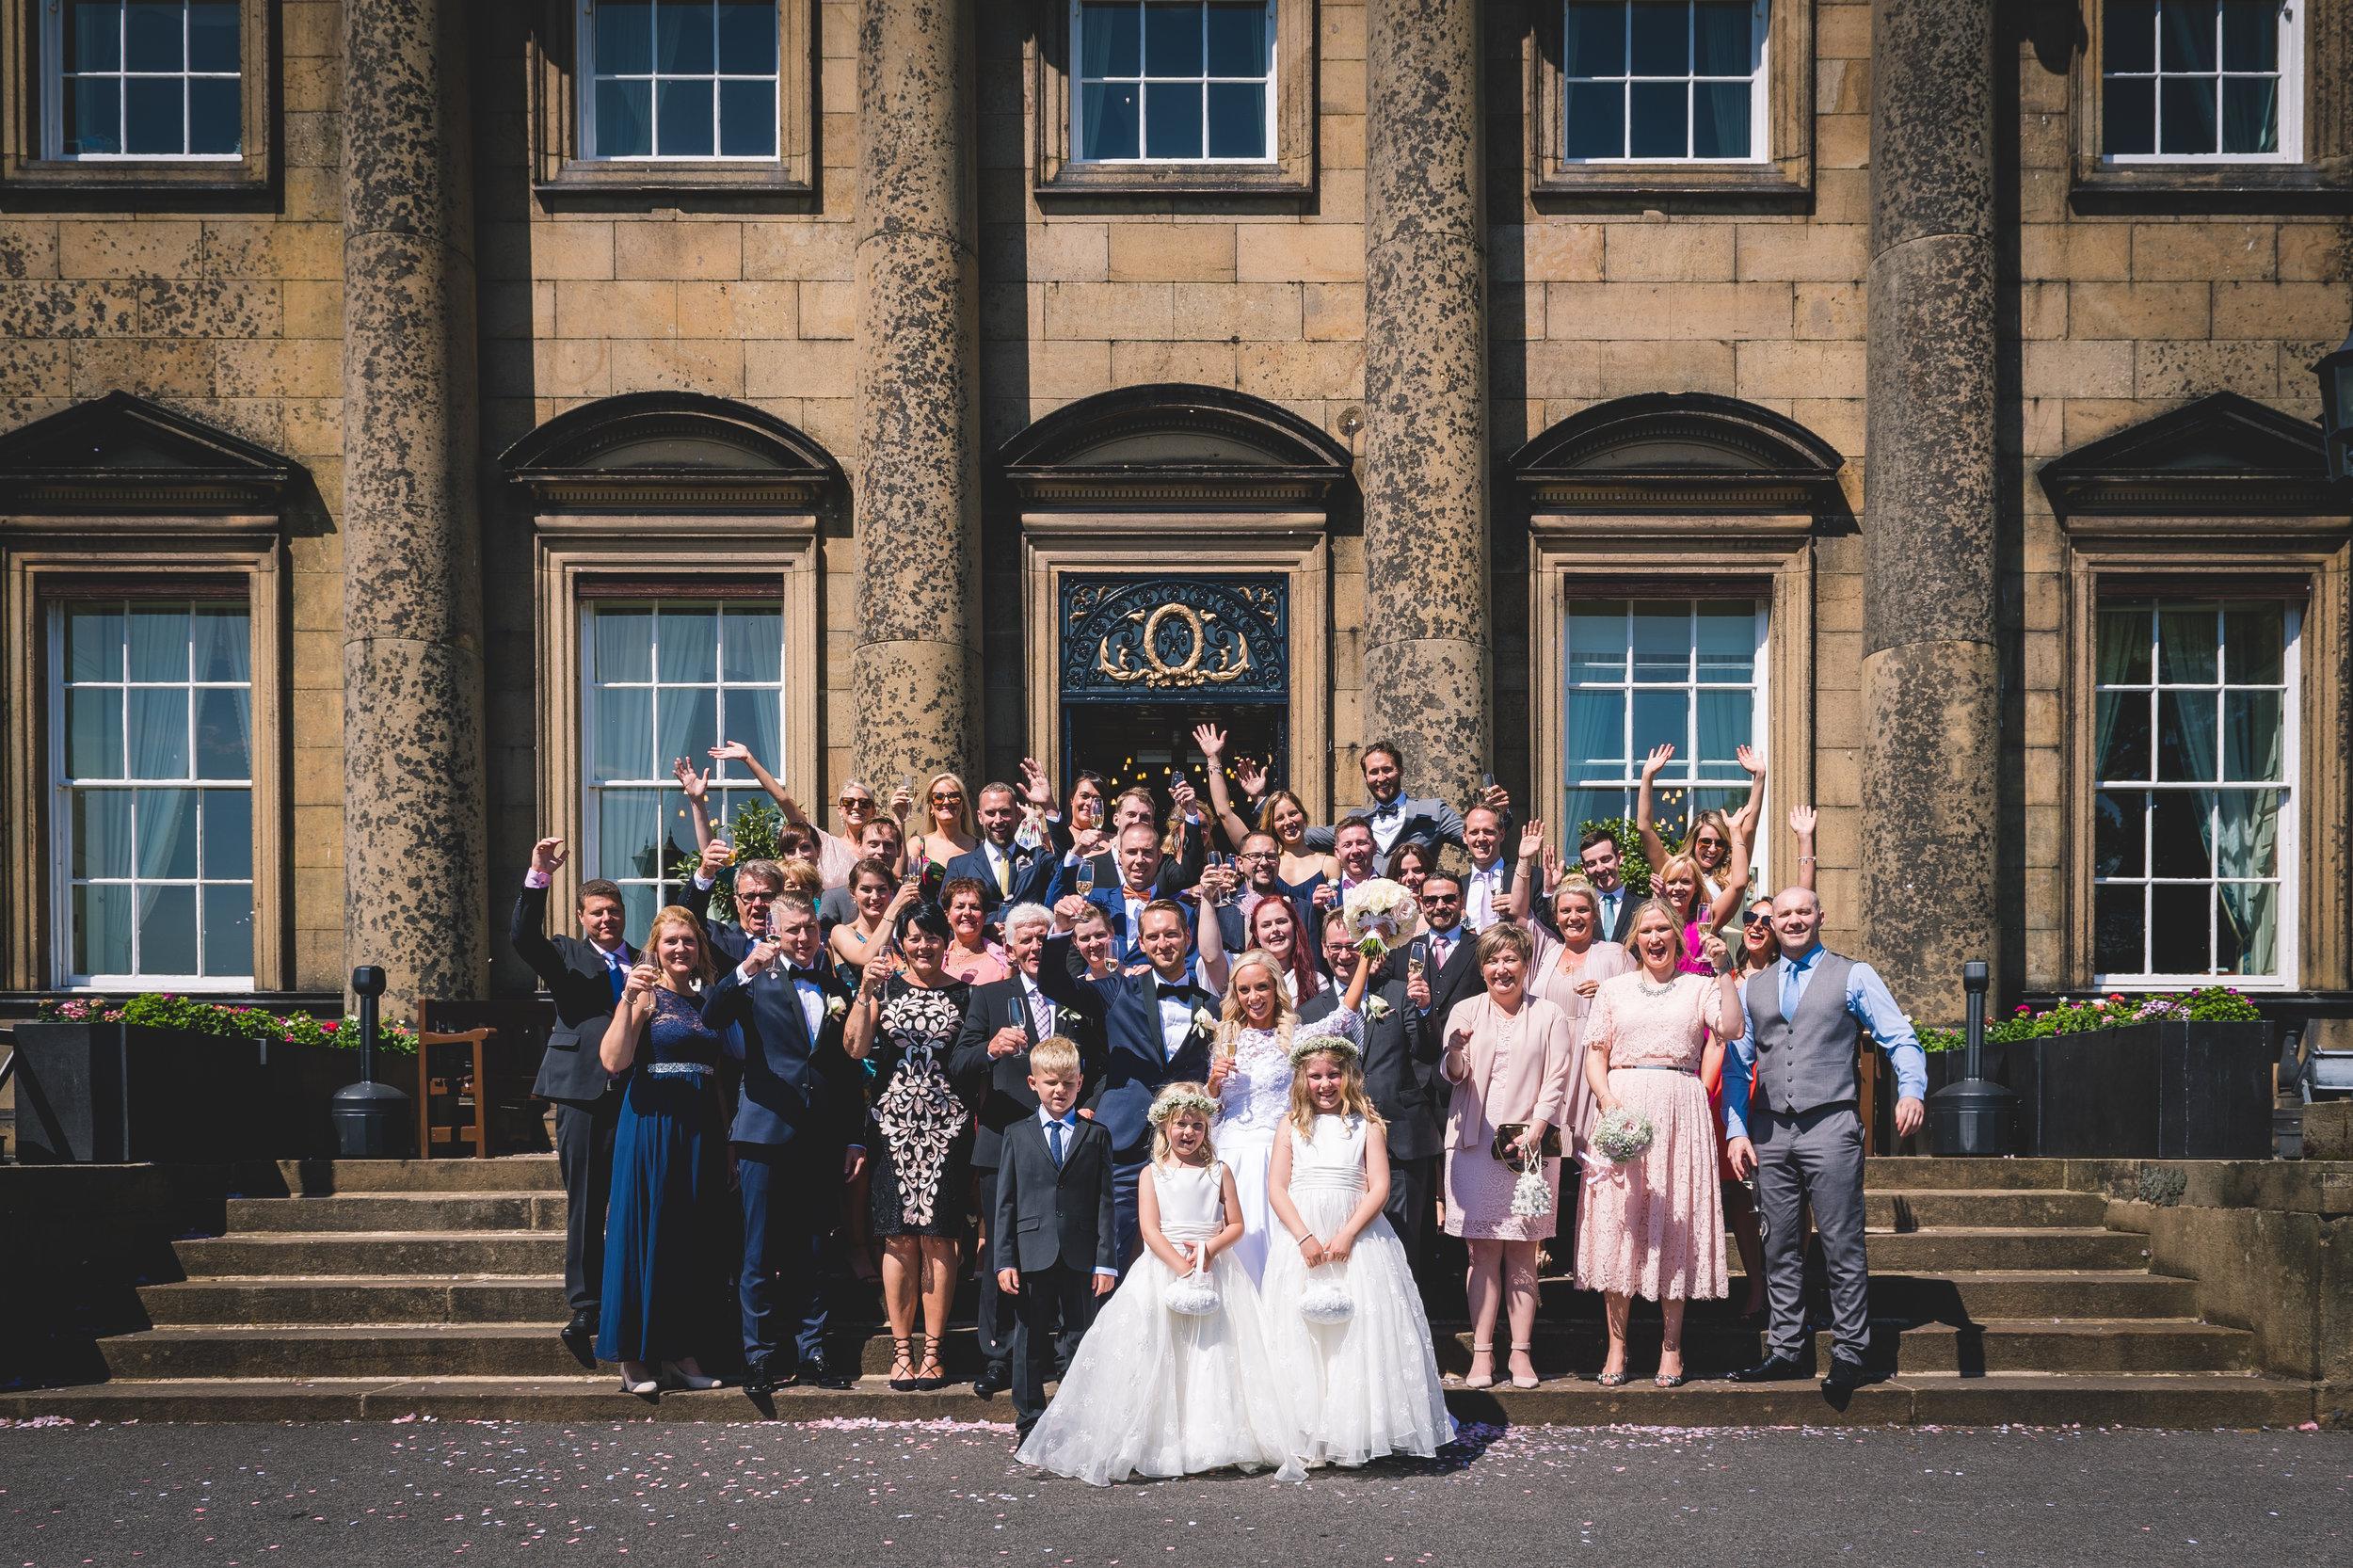 Denton Hall Family Wedding Photo